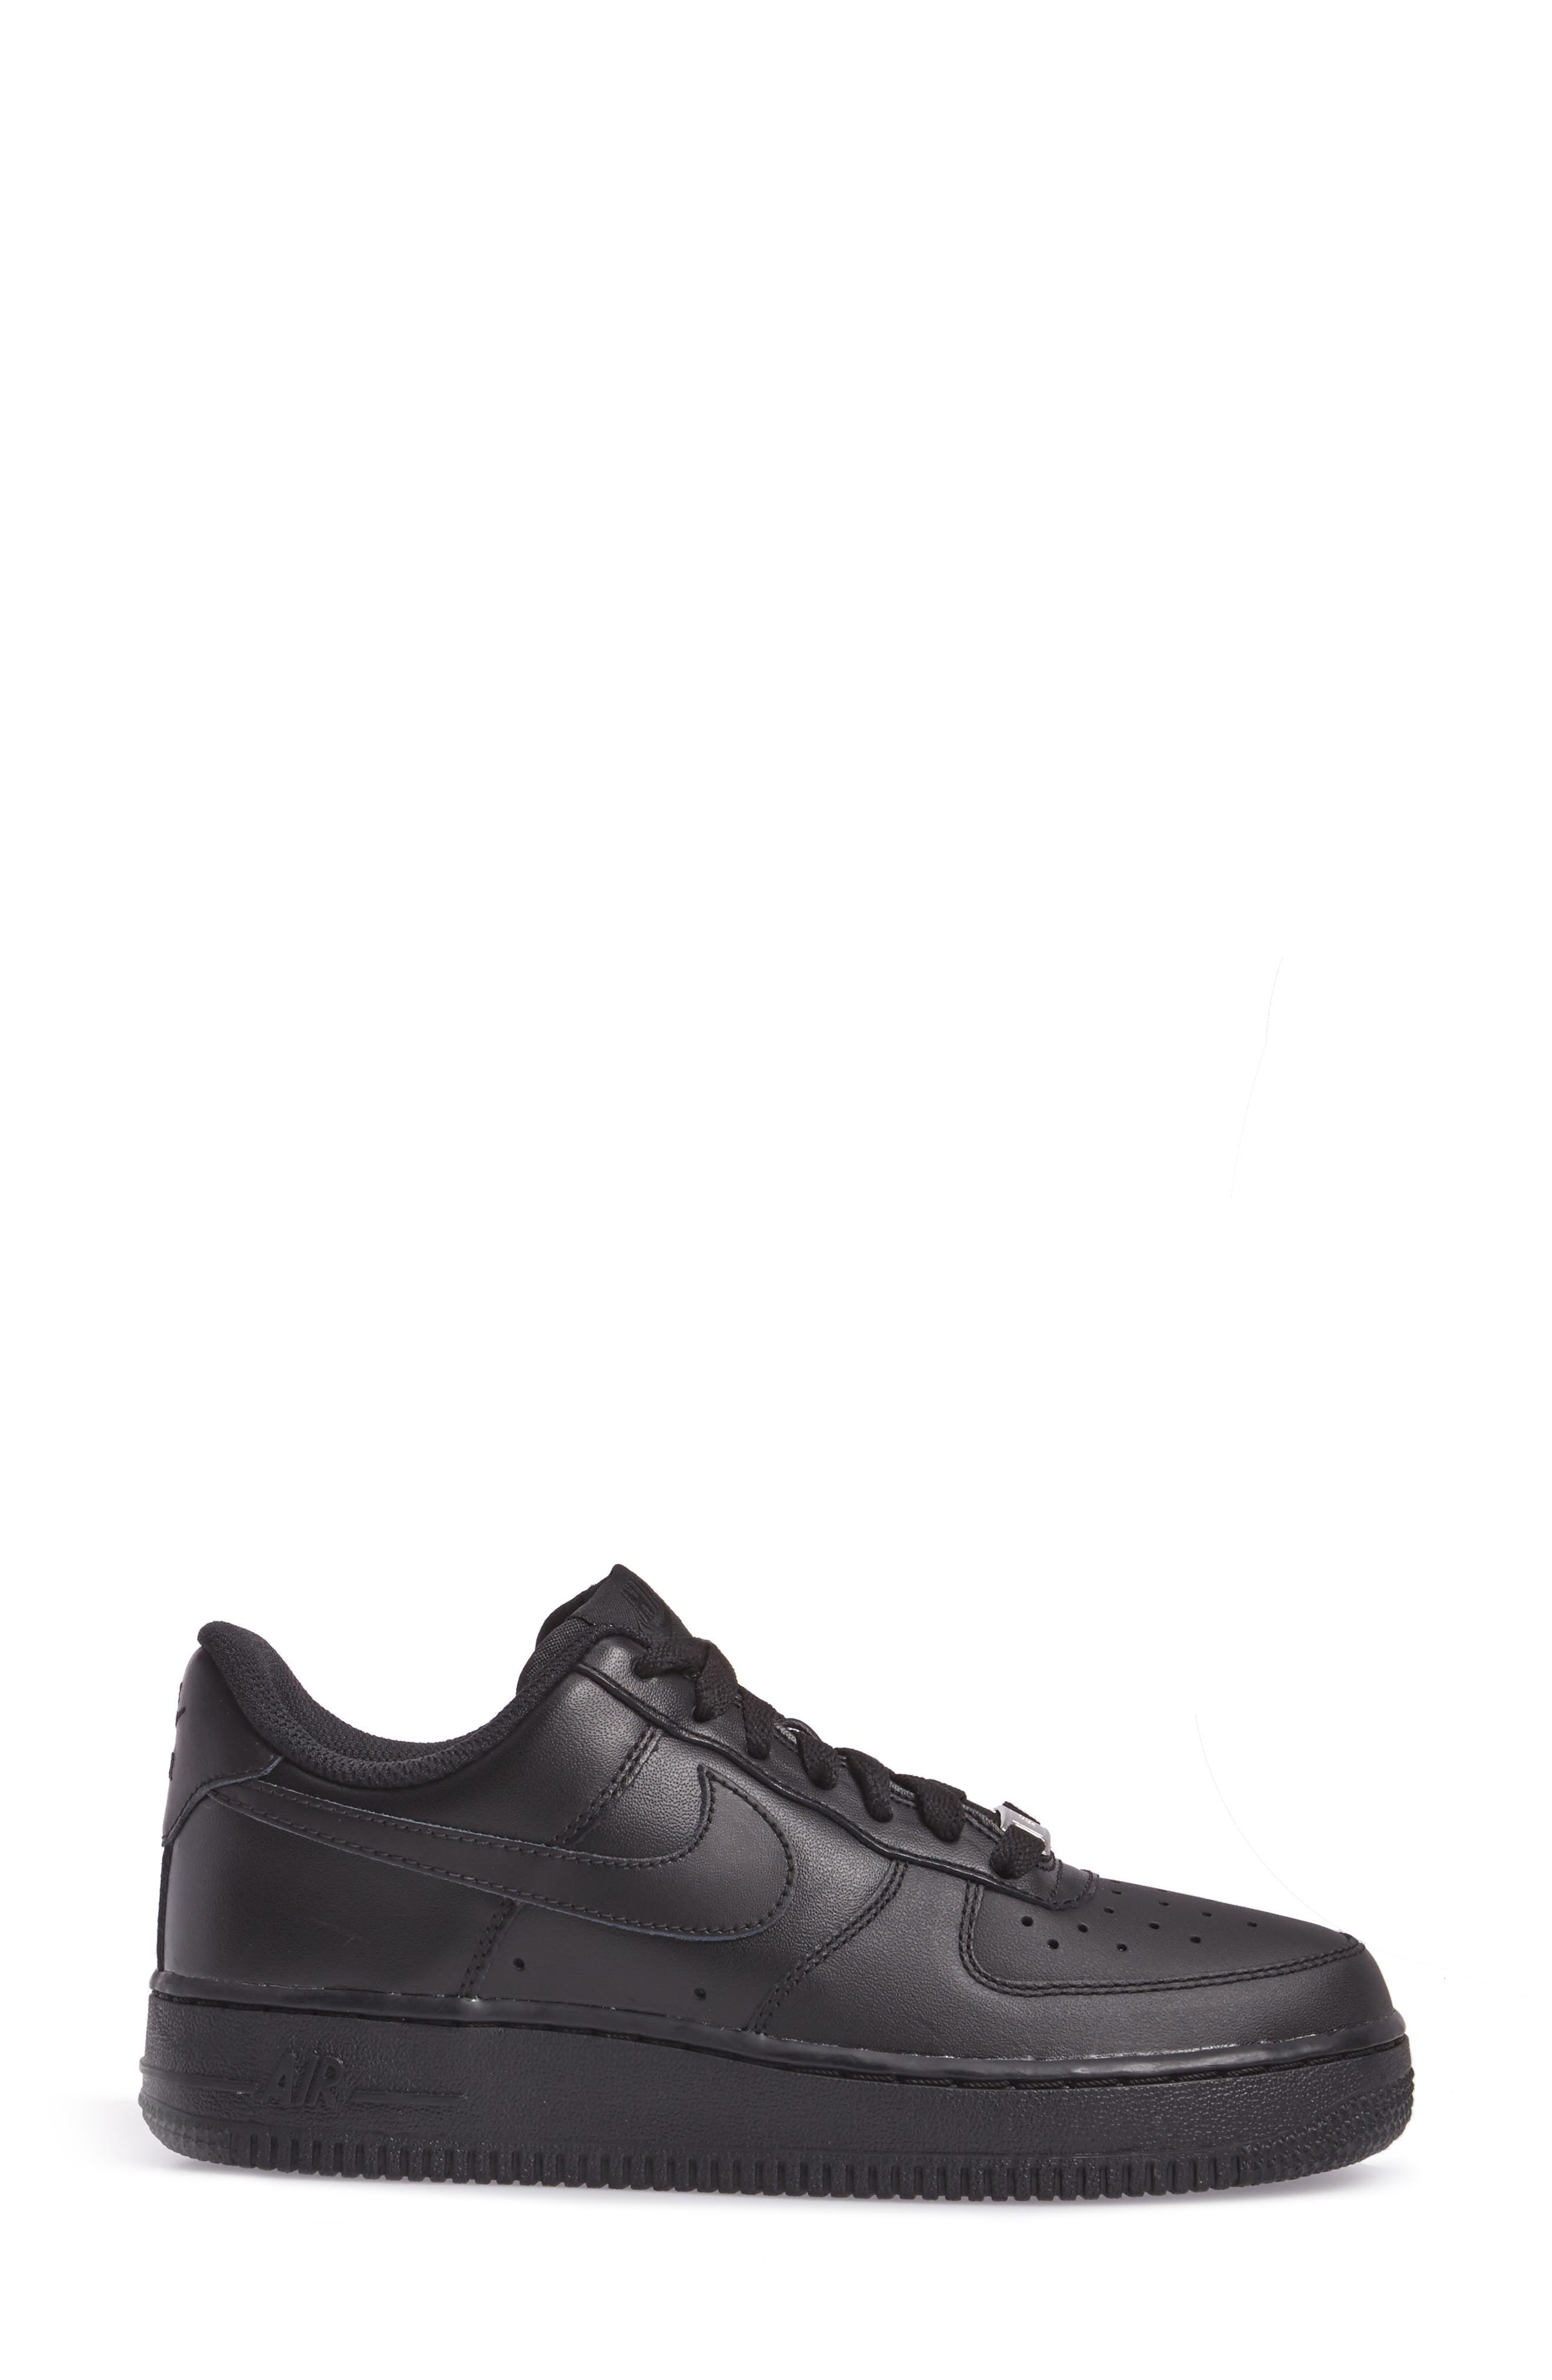 NIKE, 'Air Force 1' Basketball Sneaker, Alternate thumbnail 3, color, BLACK/ BLACK